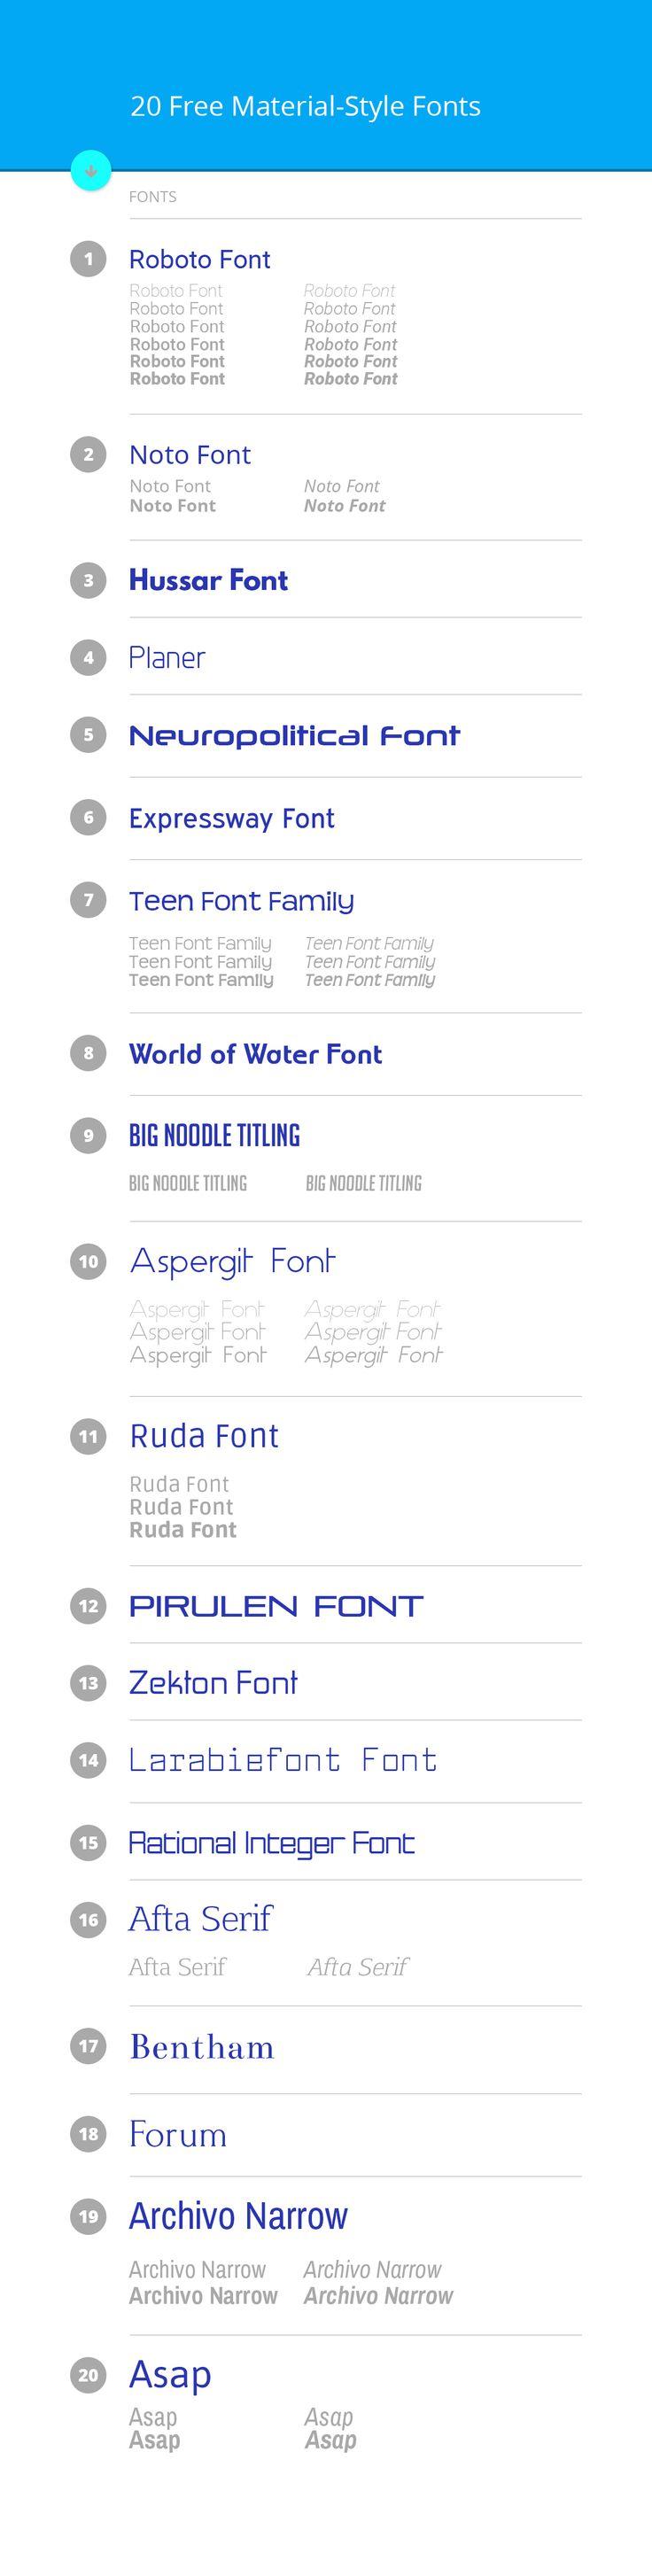 20 Gratis-Alternativen zu Material Fonts #materialdesign